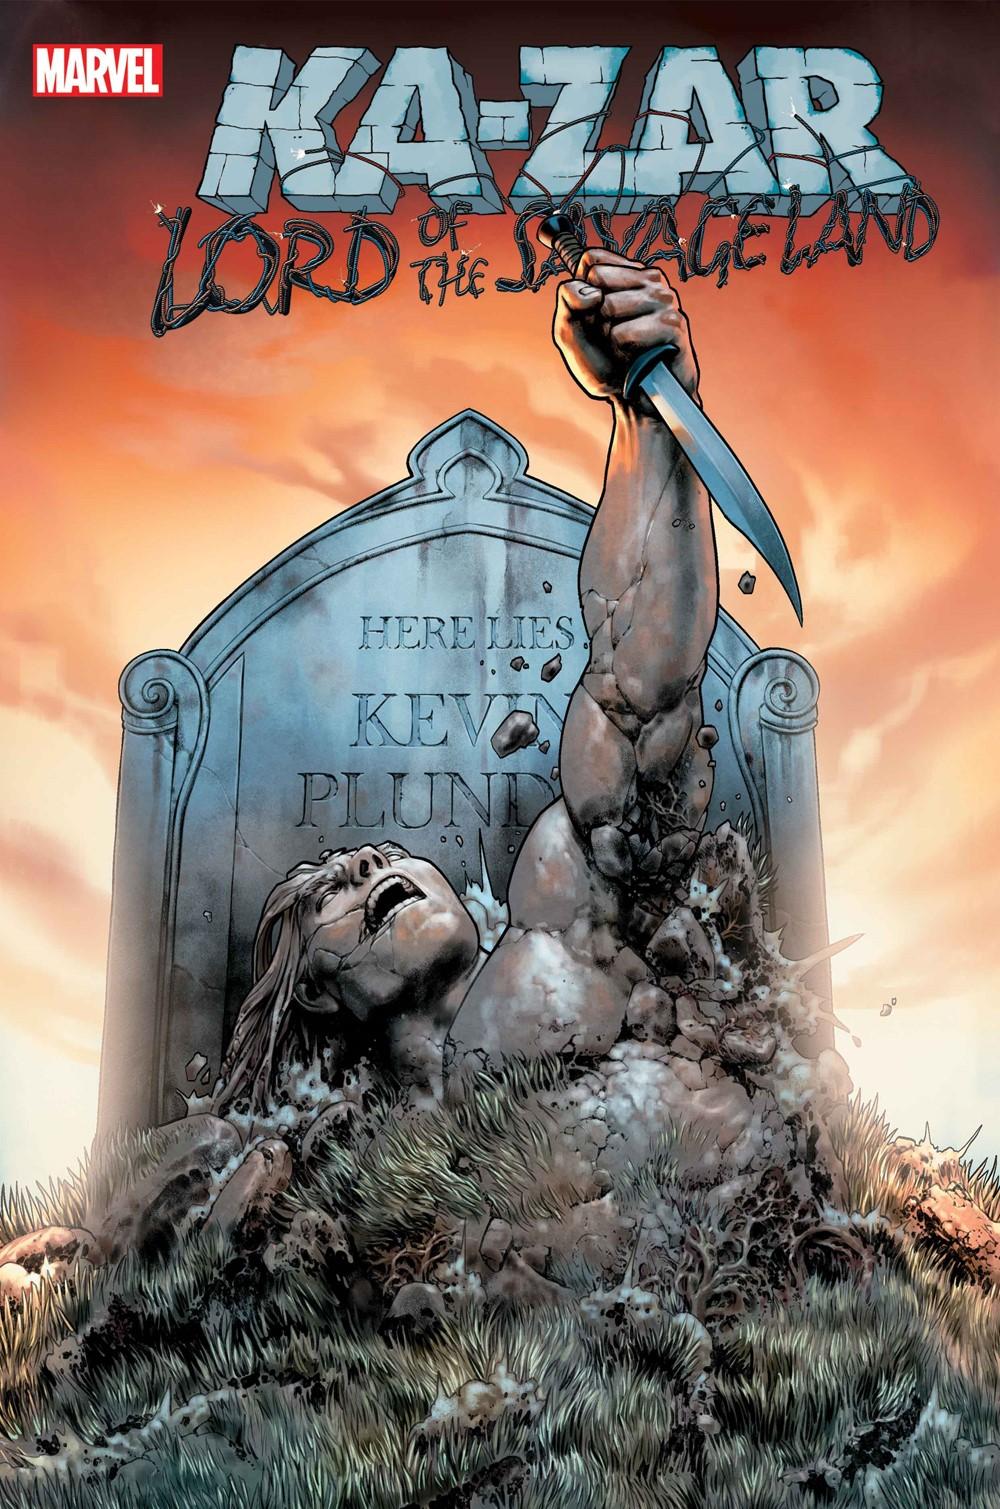 KAZARLORDSAVLAND2021001_COV-1 Marvel Comics September 2021 Solicitations